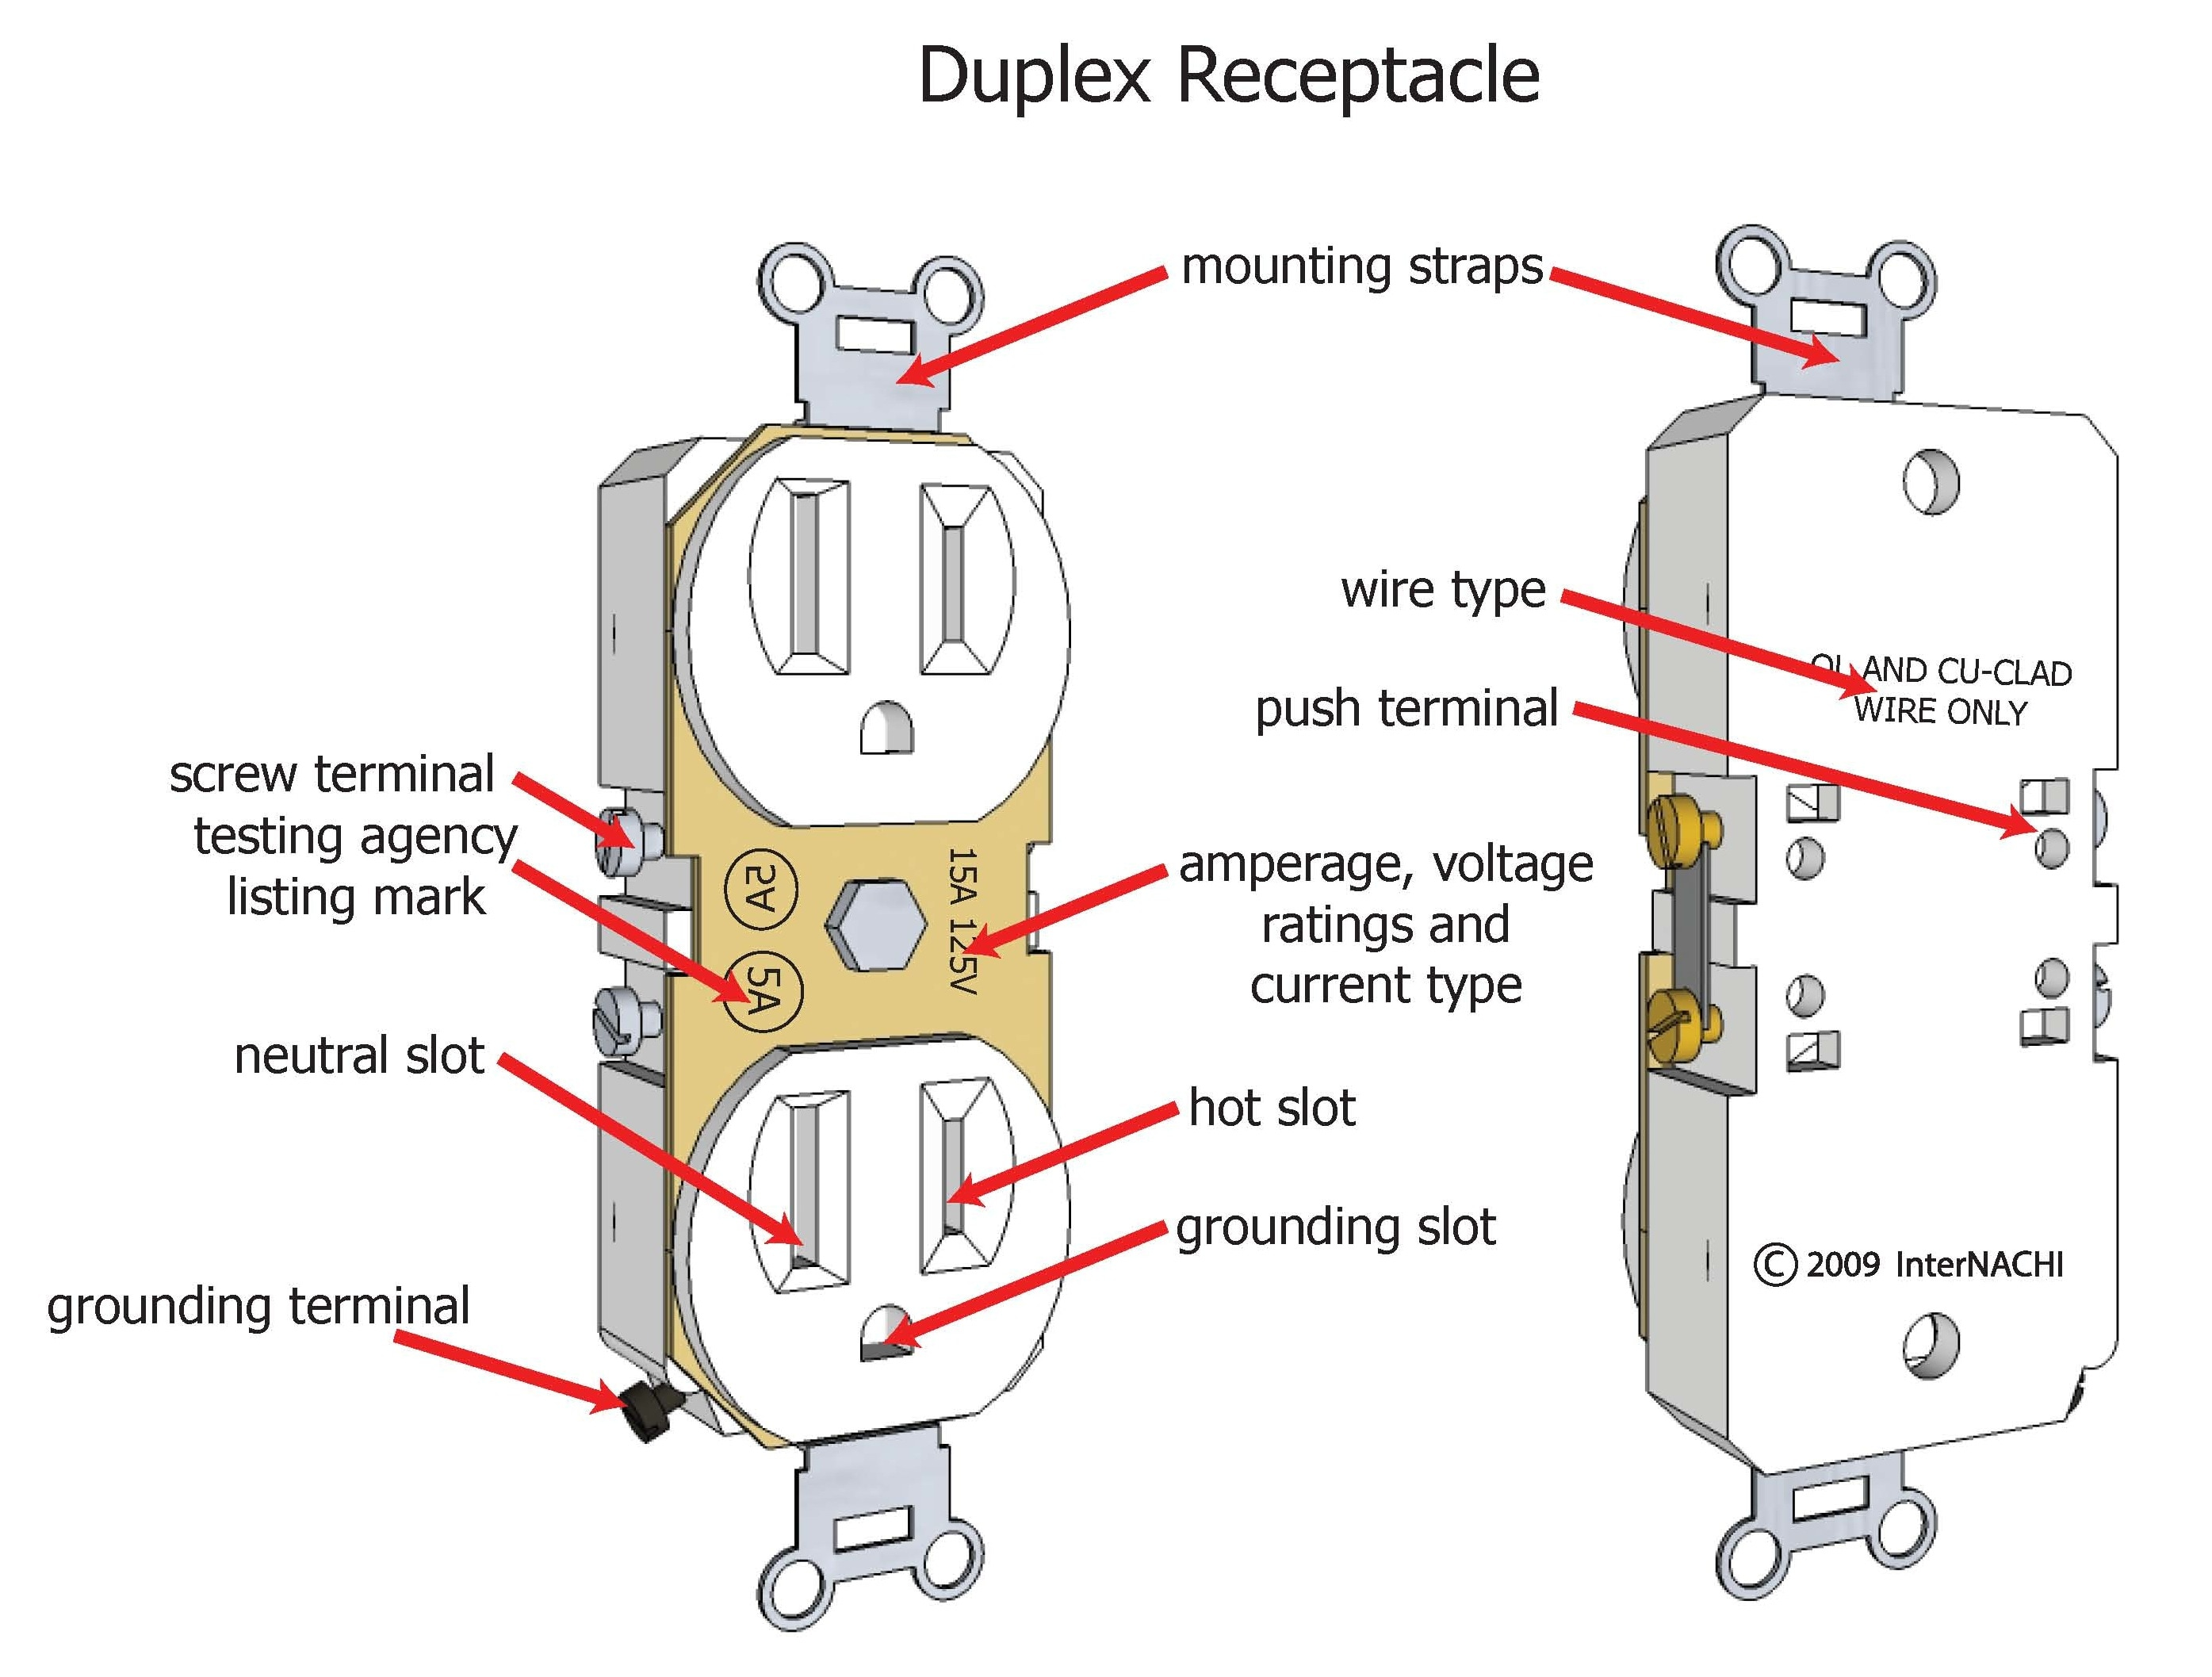 Duplex receptacle.